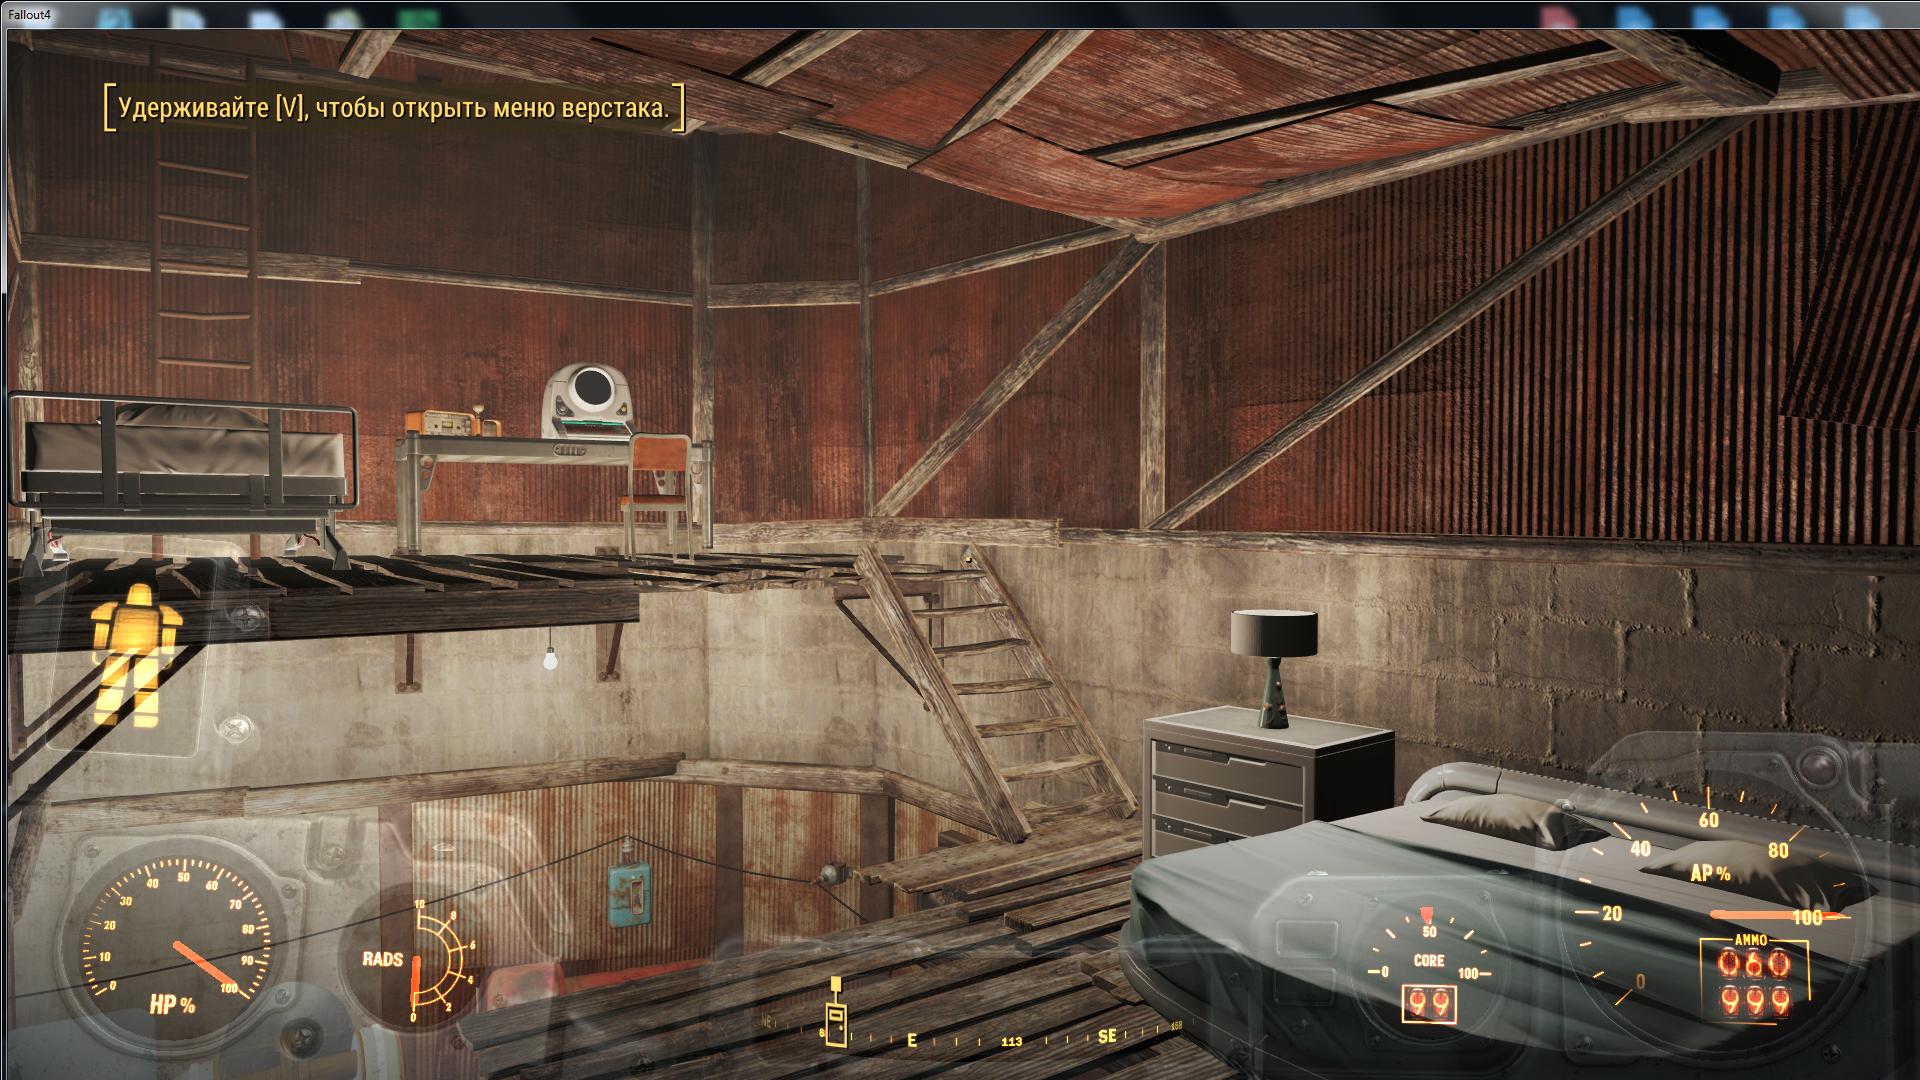 Мой дом в Даймонд-сити . - Fallout 4